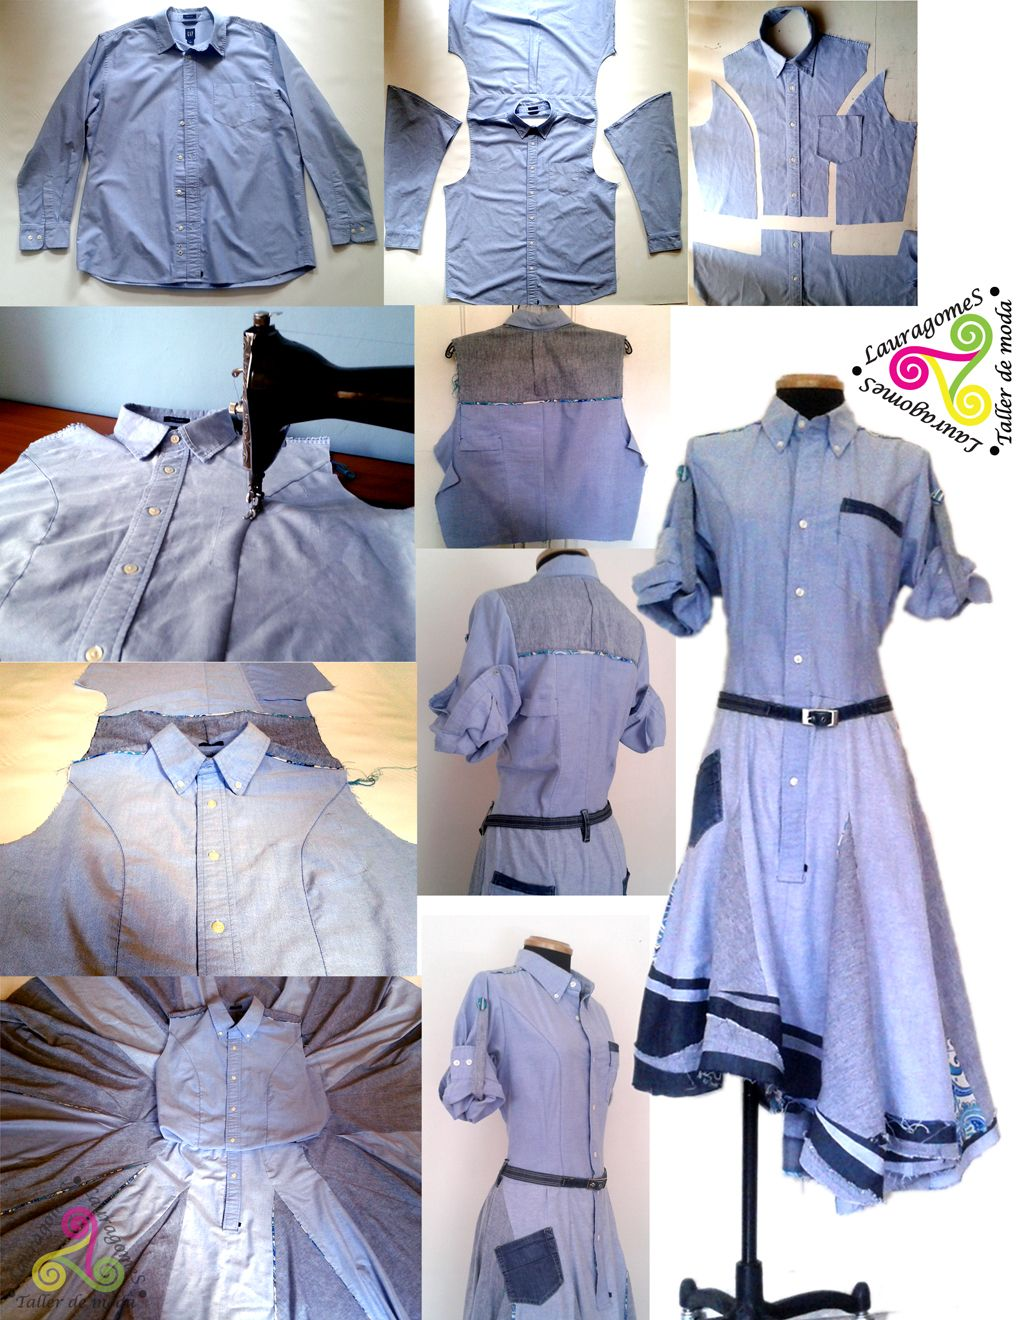 de camisa de hombre a vestido para Flort...  #customized #recicled #clothes